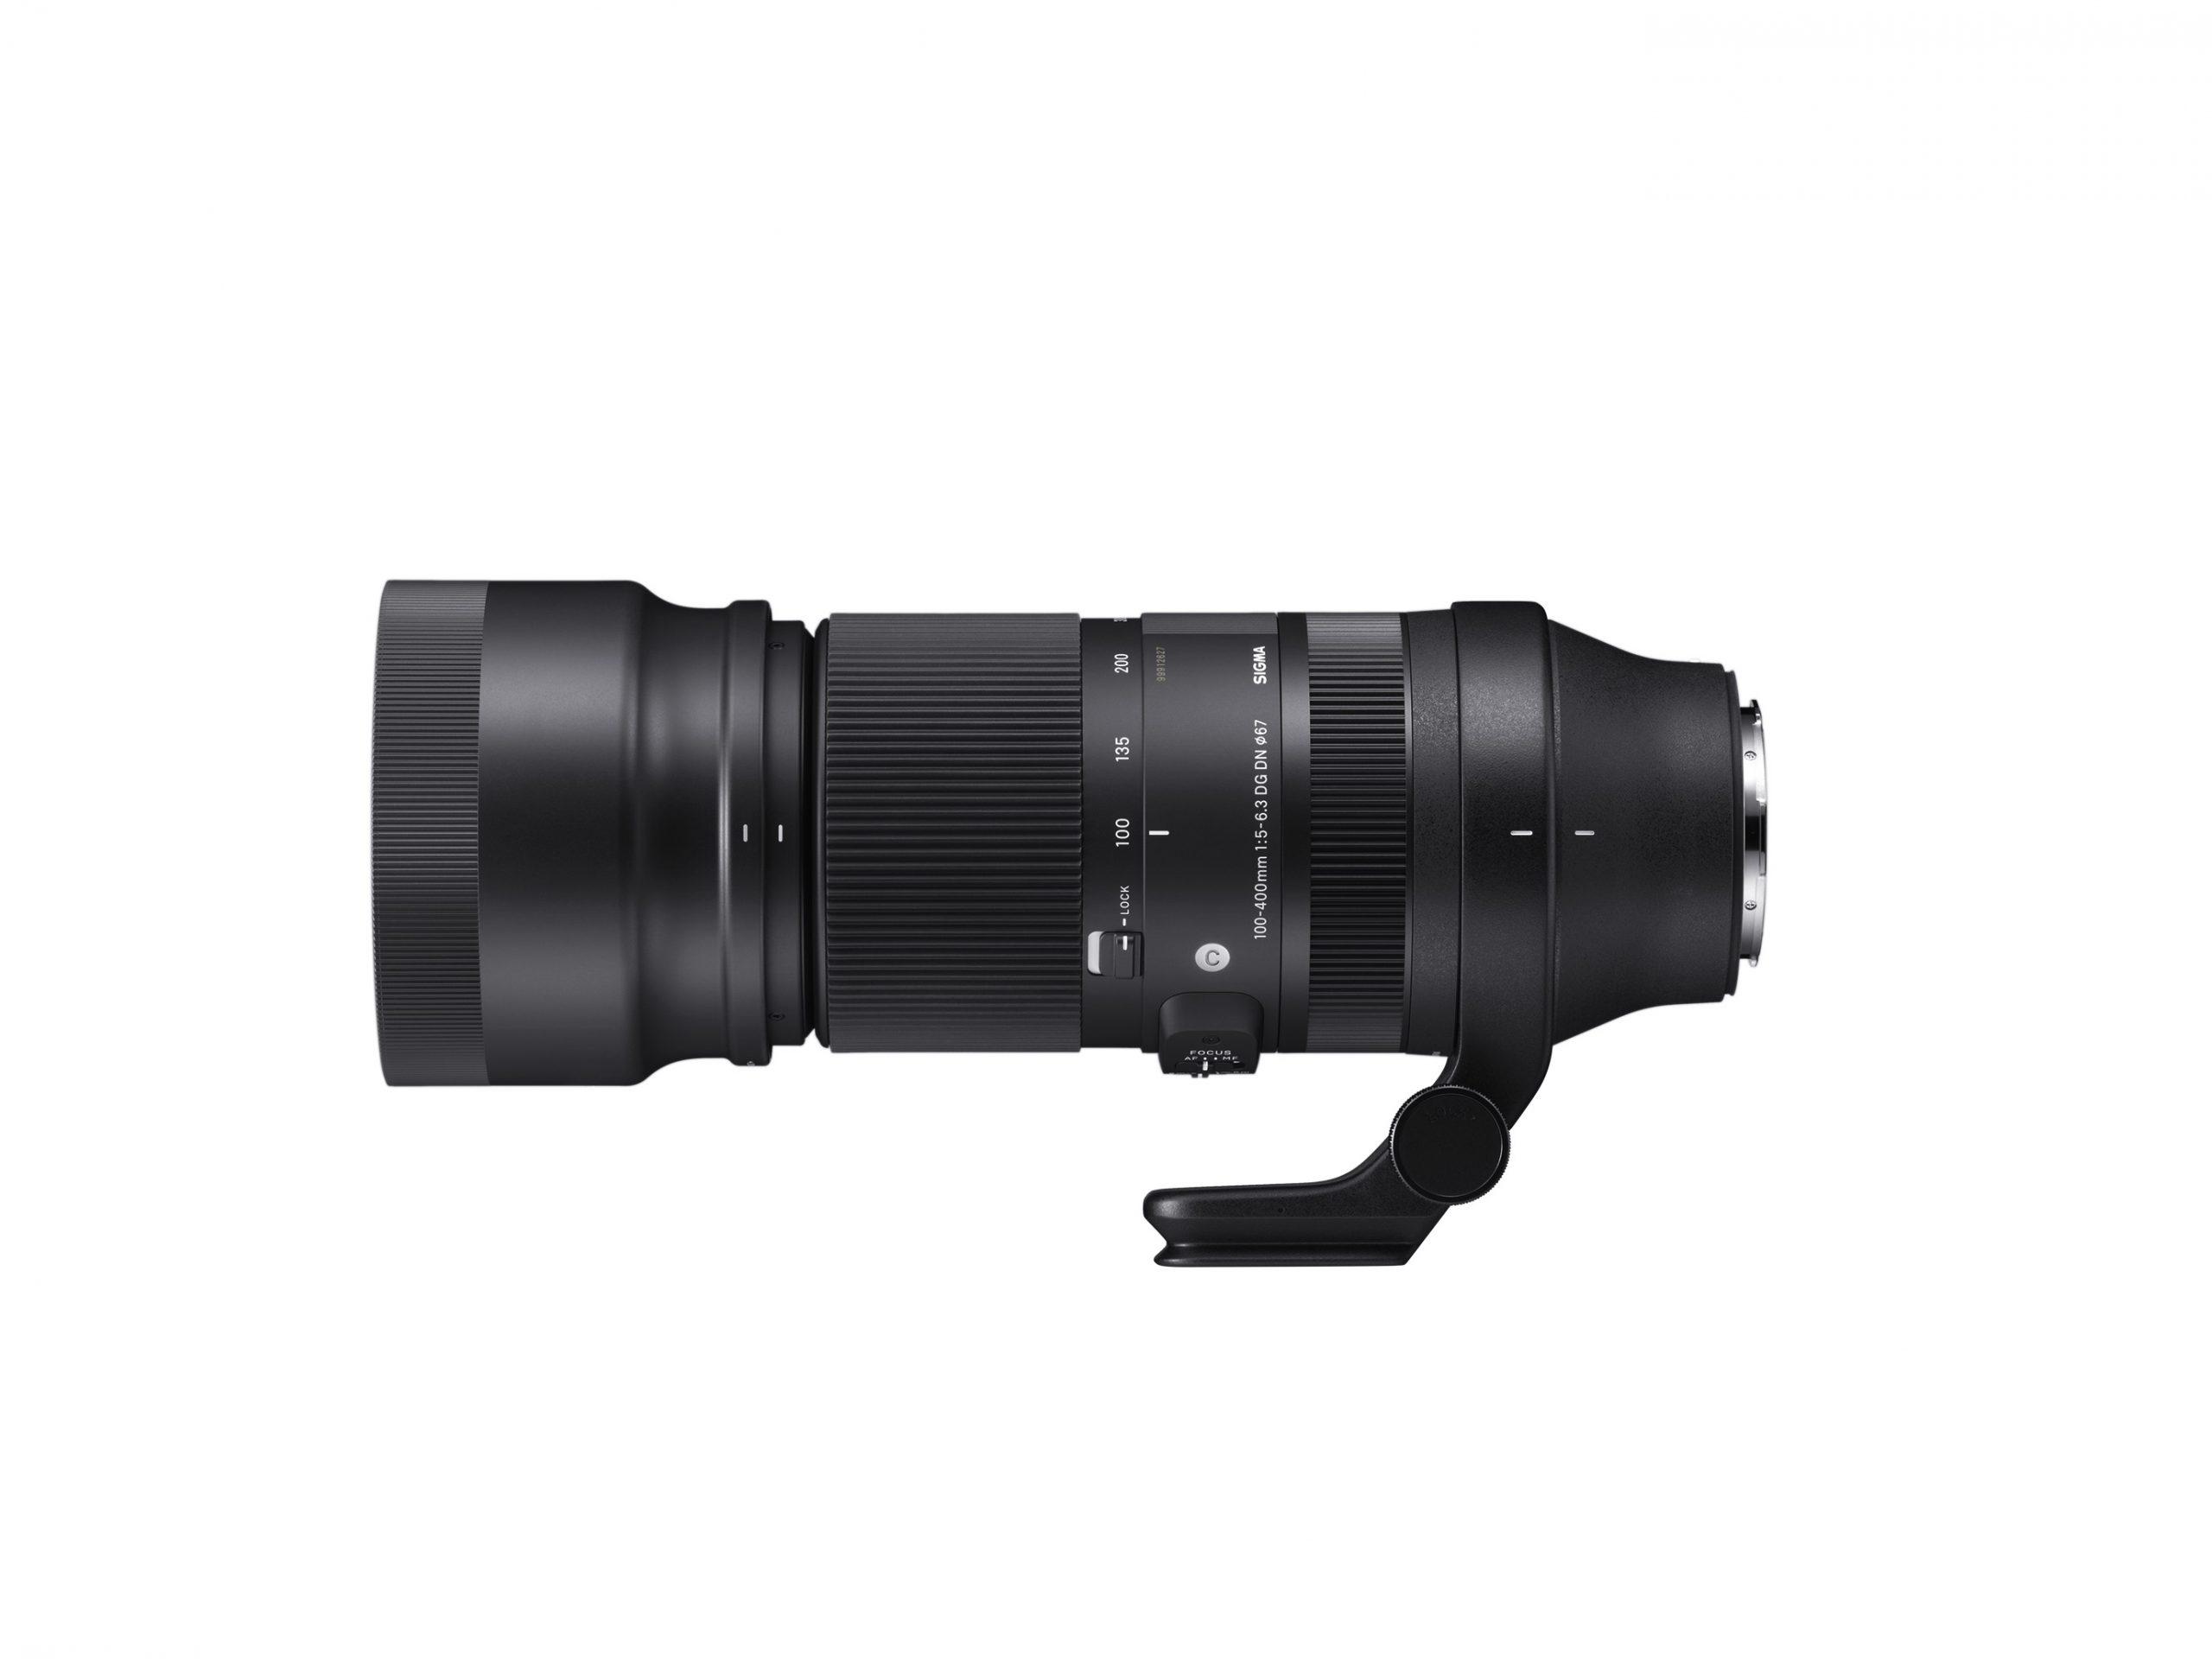 Nowość. SIGMA 100-400mm F5-6.3 DG DN OS